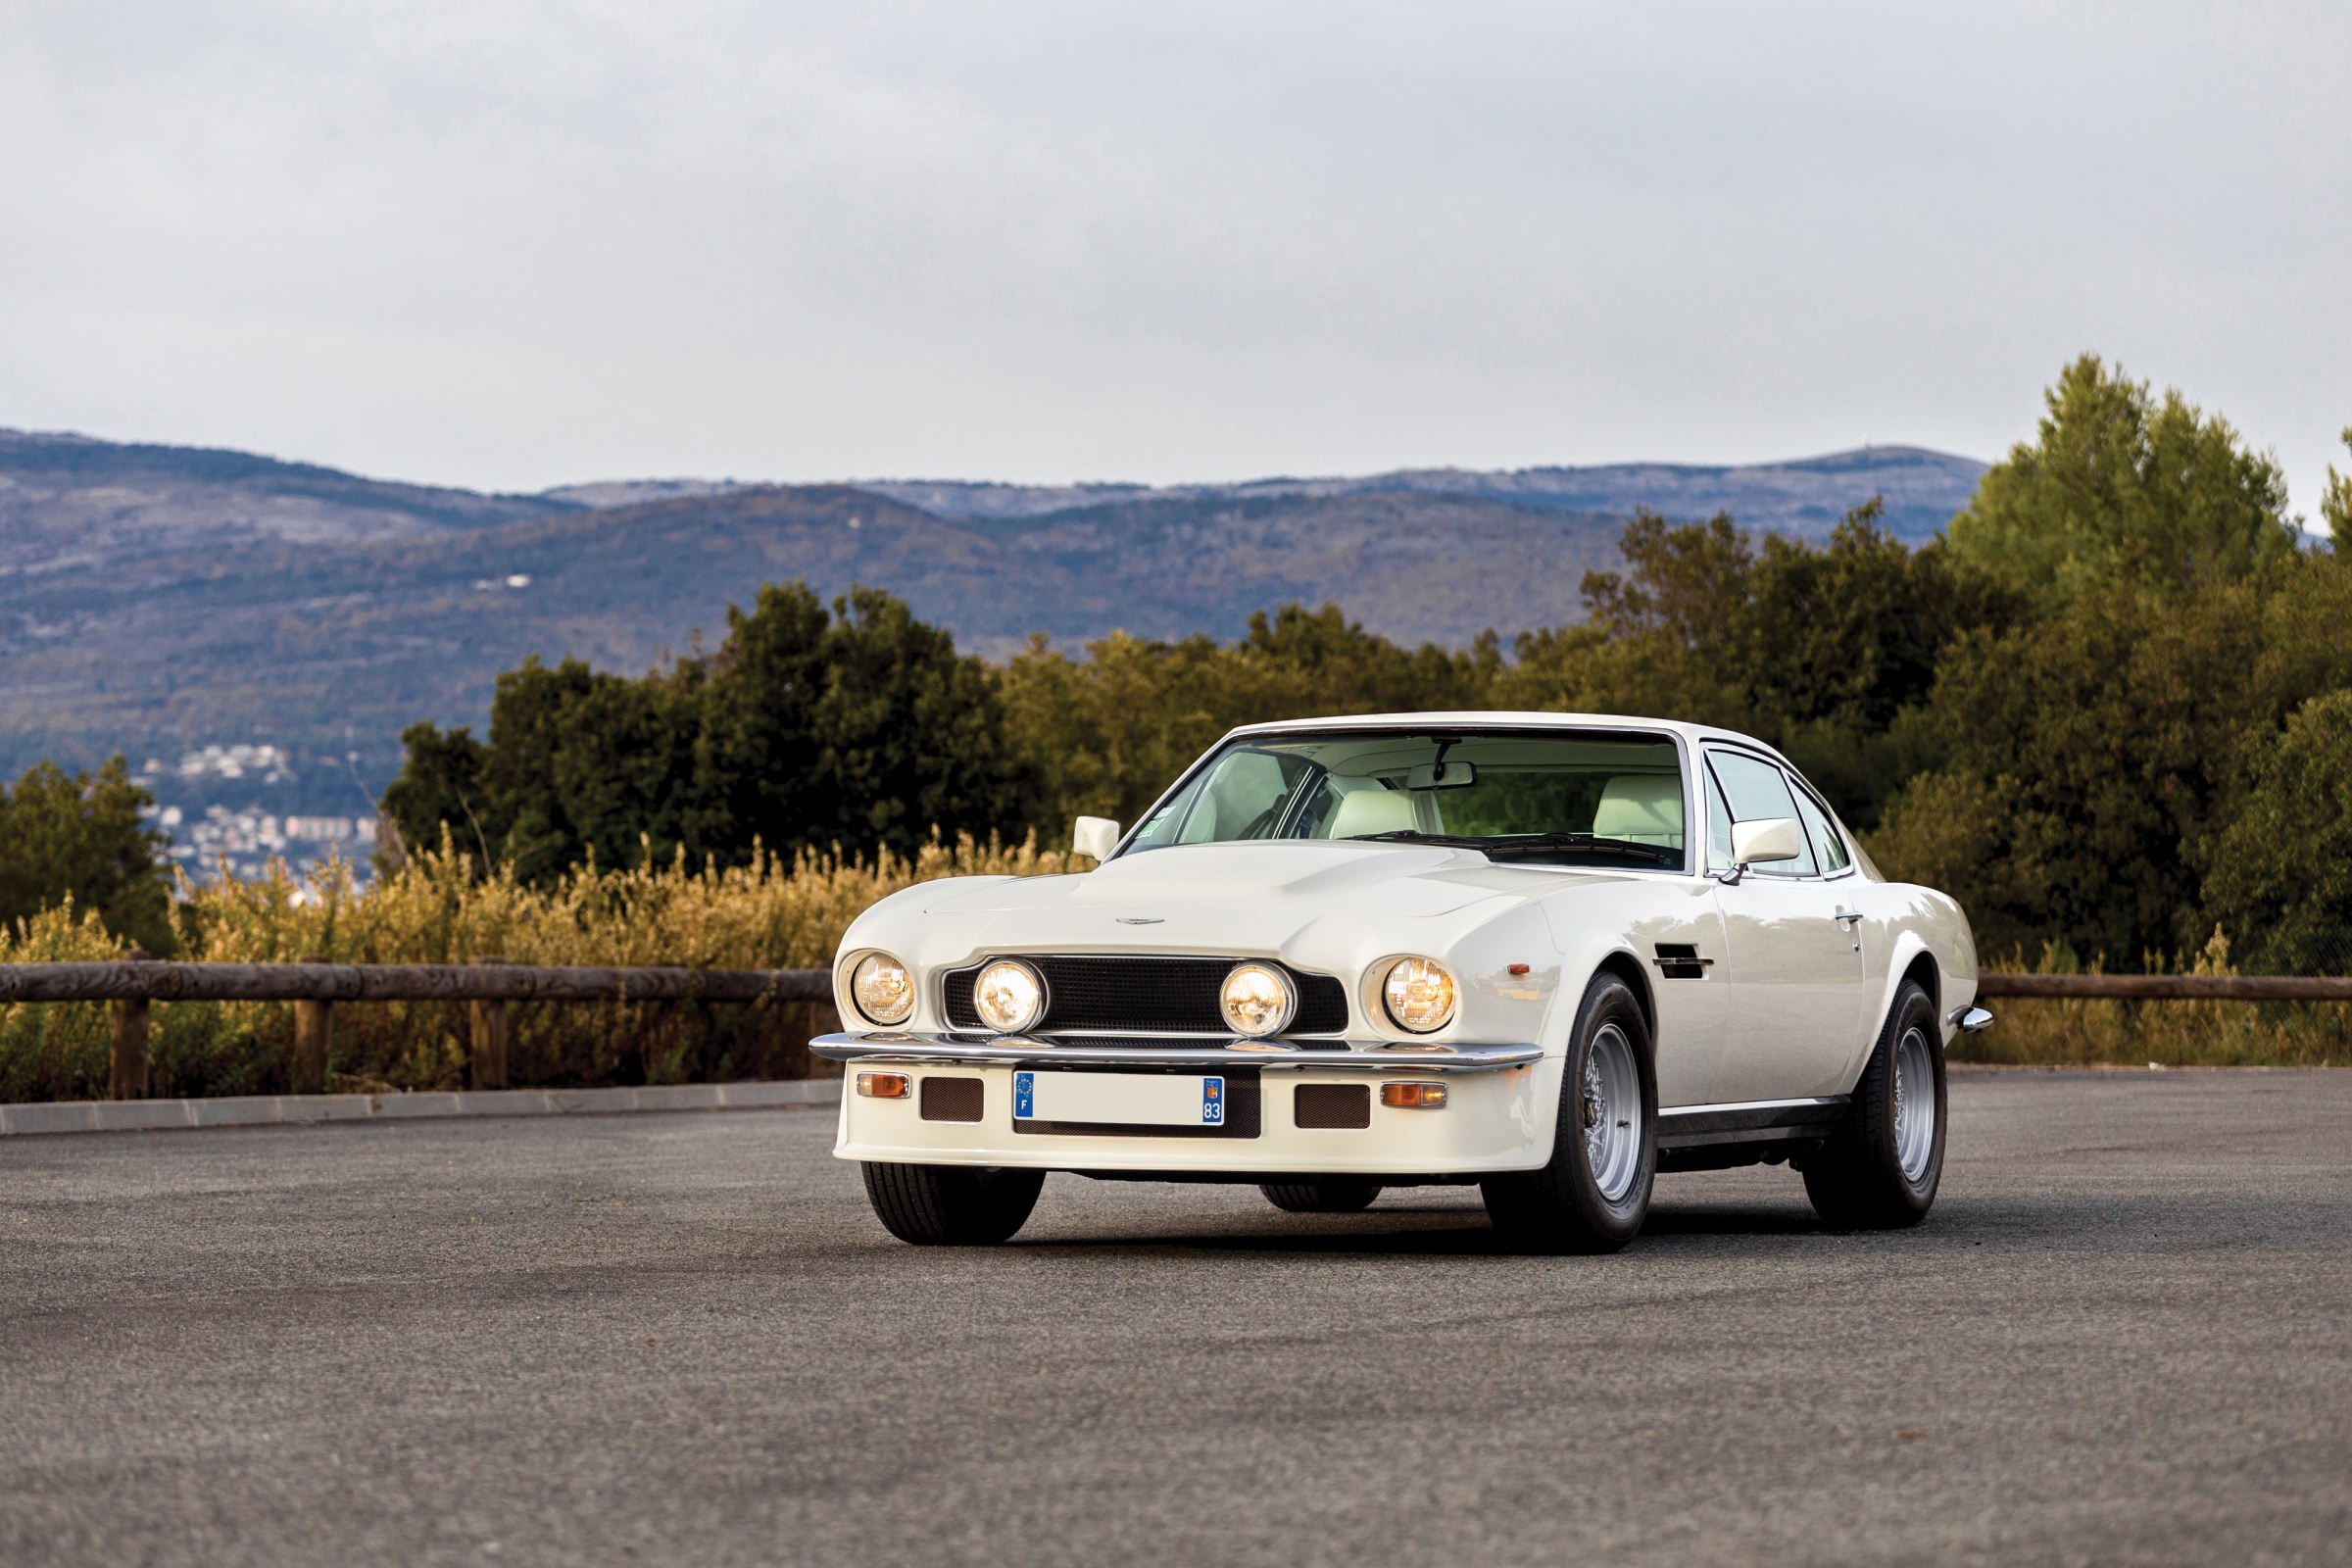 The Aston Martin V8 Vantage Oscar India Shown Here